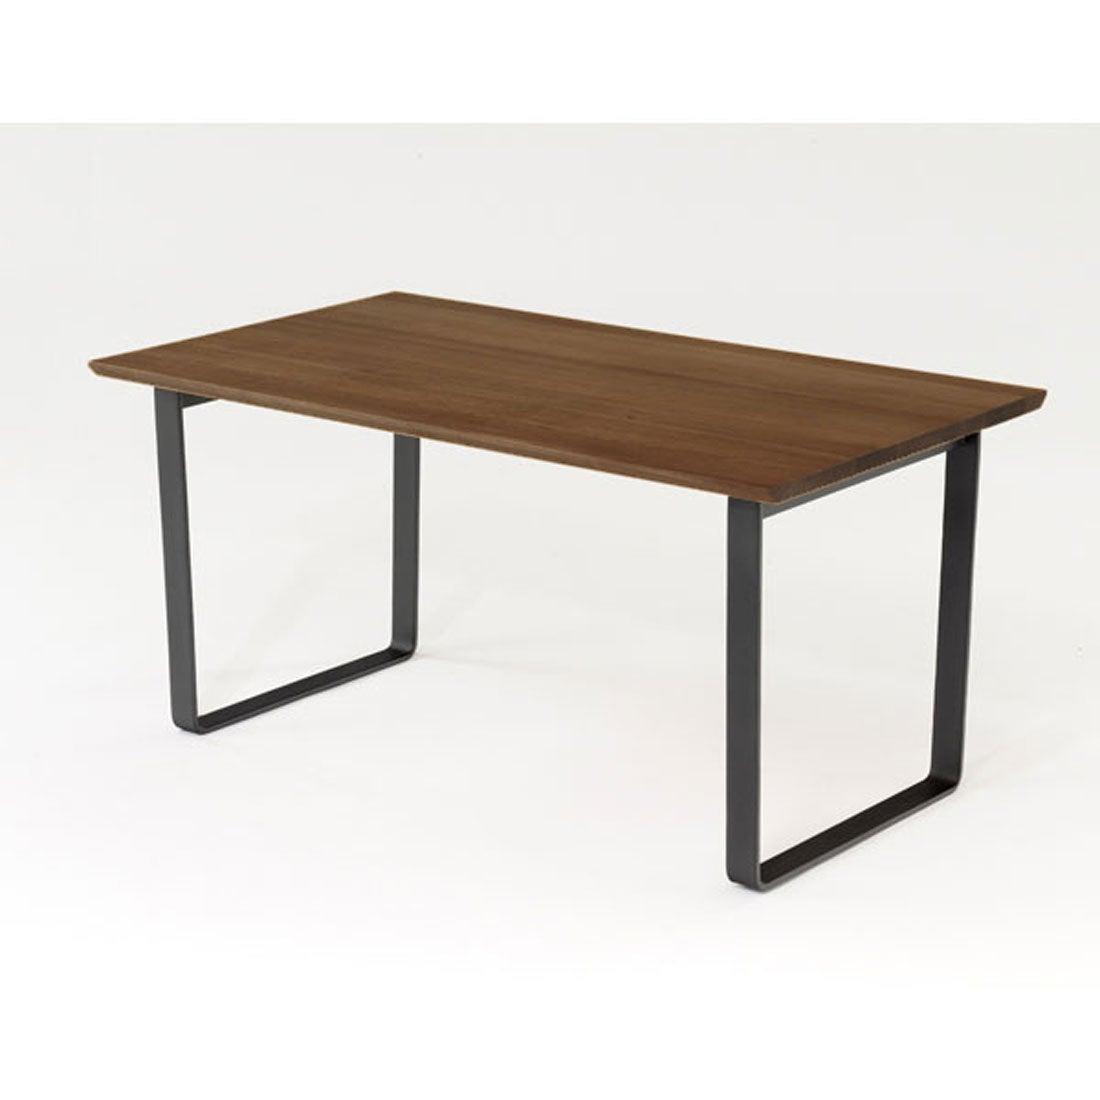 IDC OTSUKA/大塚家具 ダイニングテーブル フィル3 角・角丸天板/金属脚 W1600/ウォールナット材WN2色(ウォールナット)